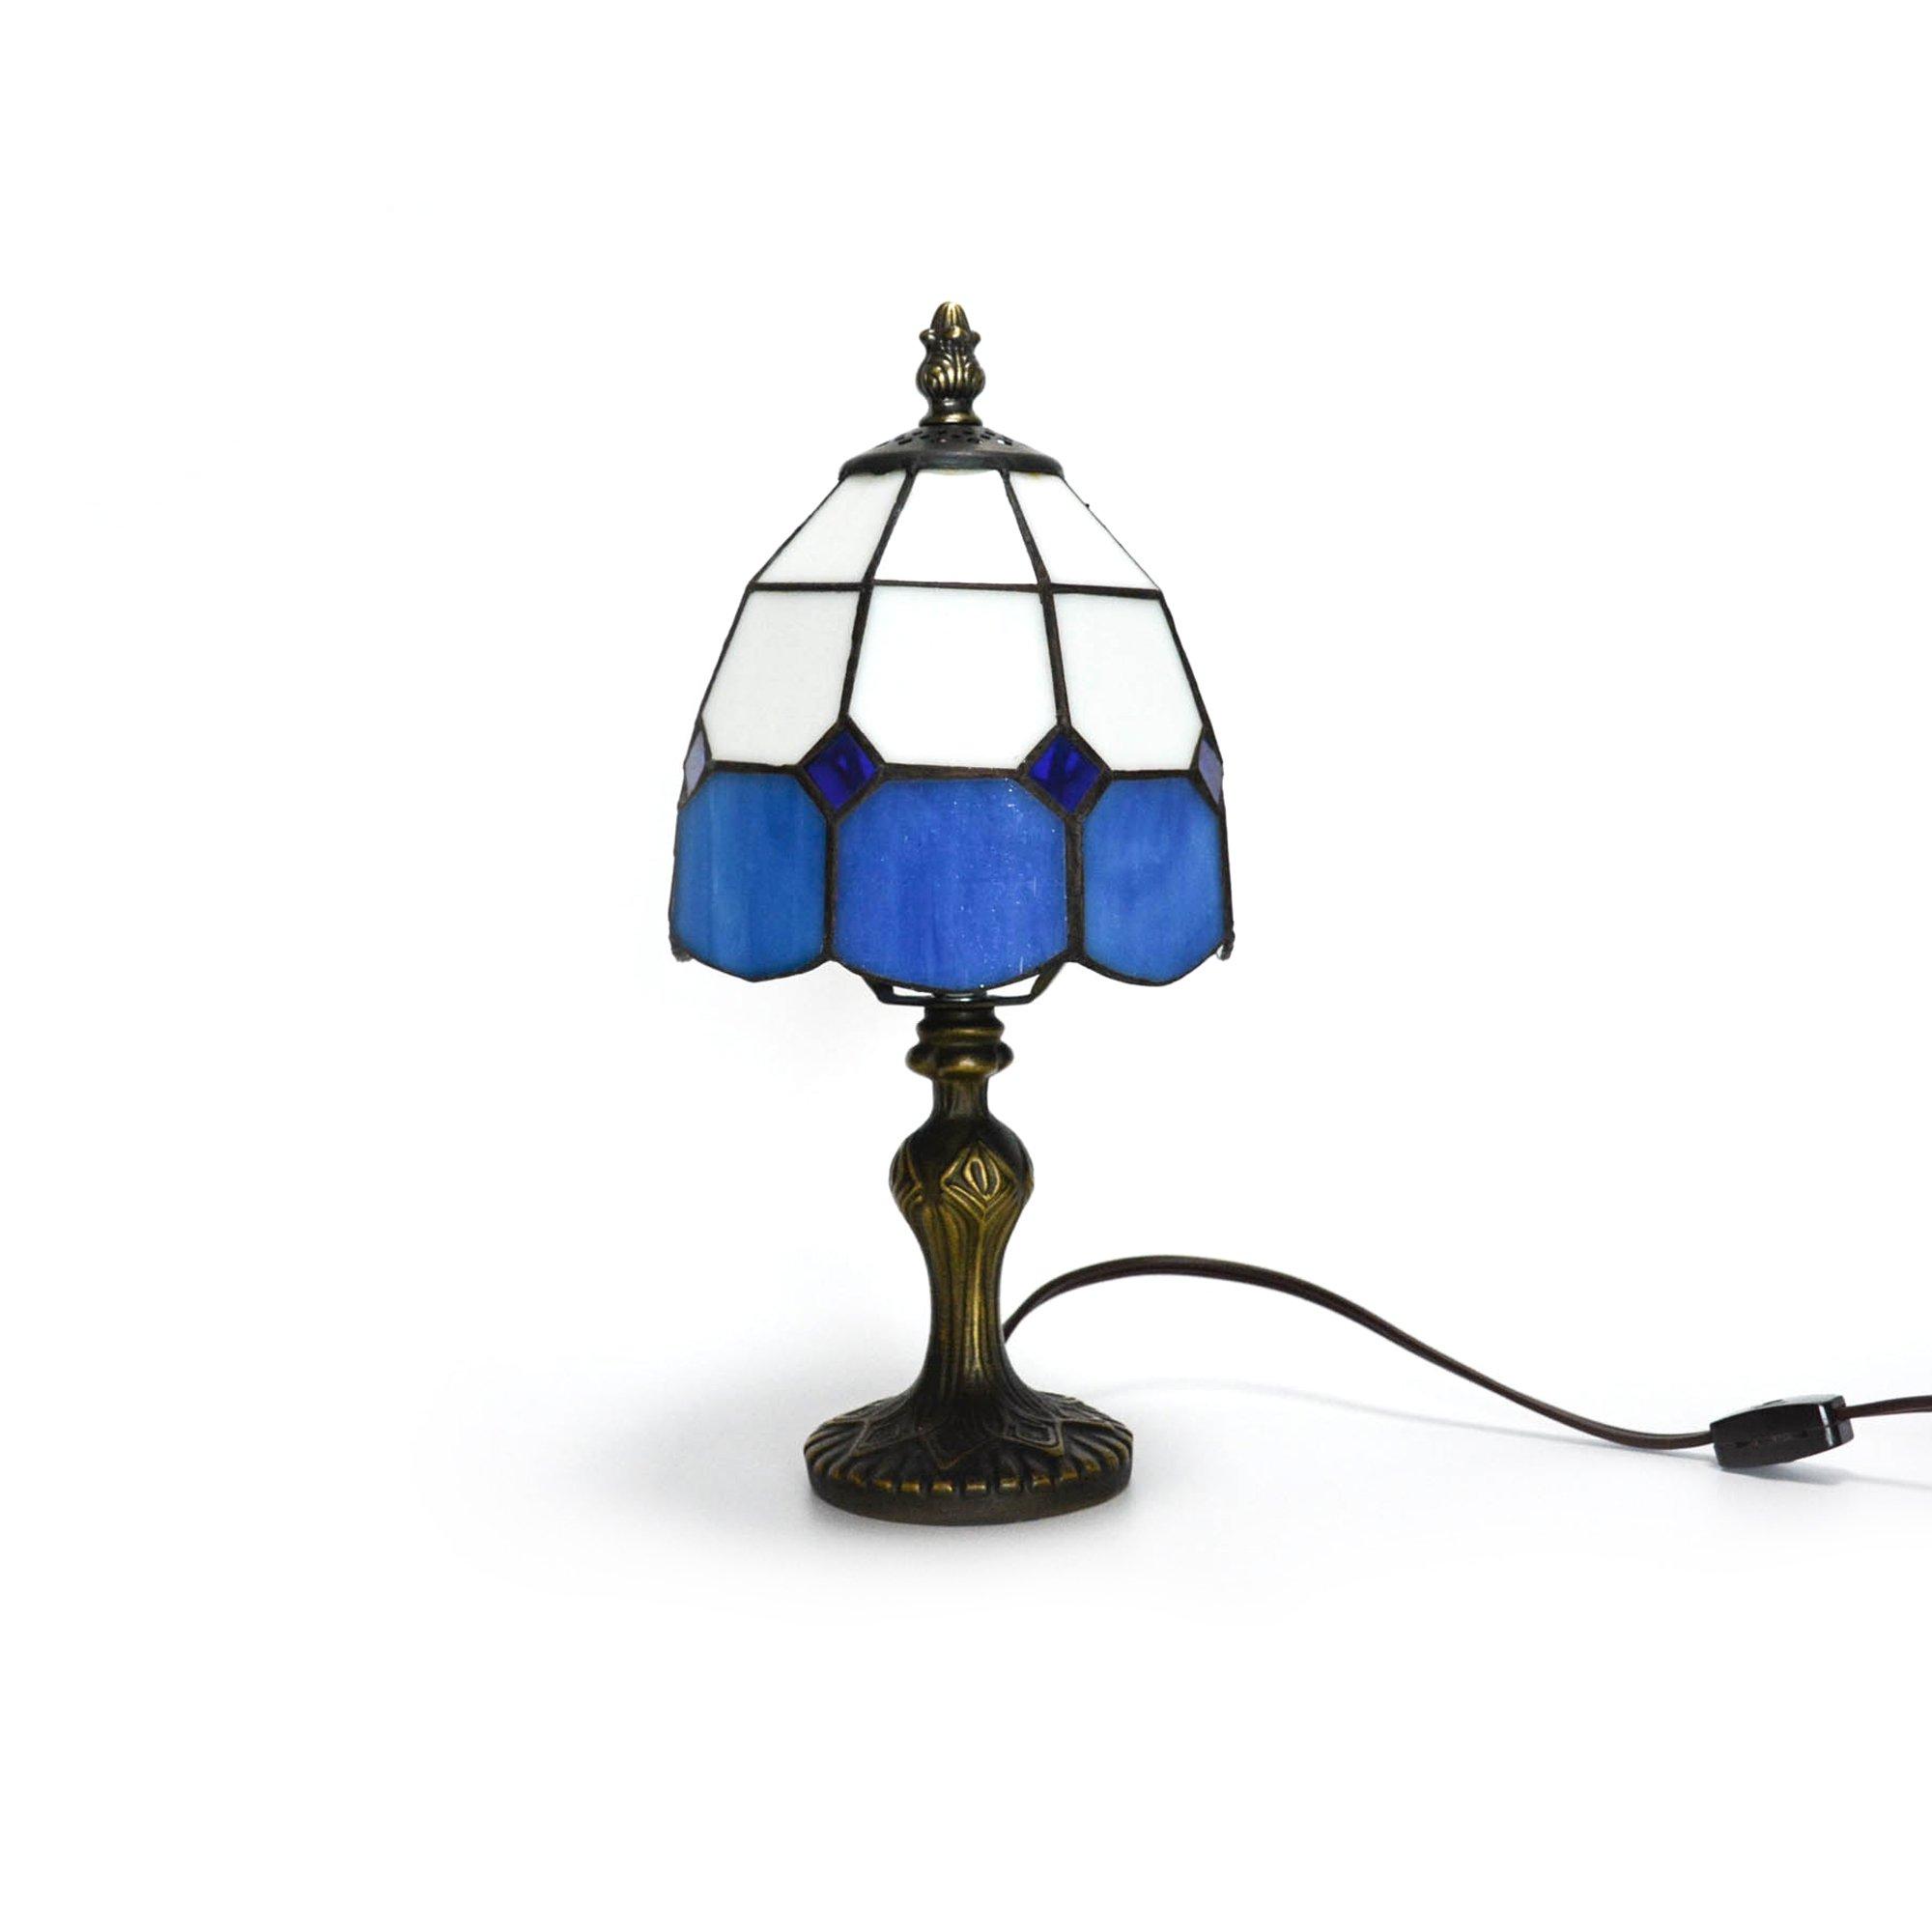 Sha.Tang-Tiffany-Style Colorful Small Table Lamp-12.3 inch Hight